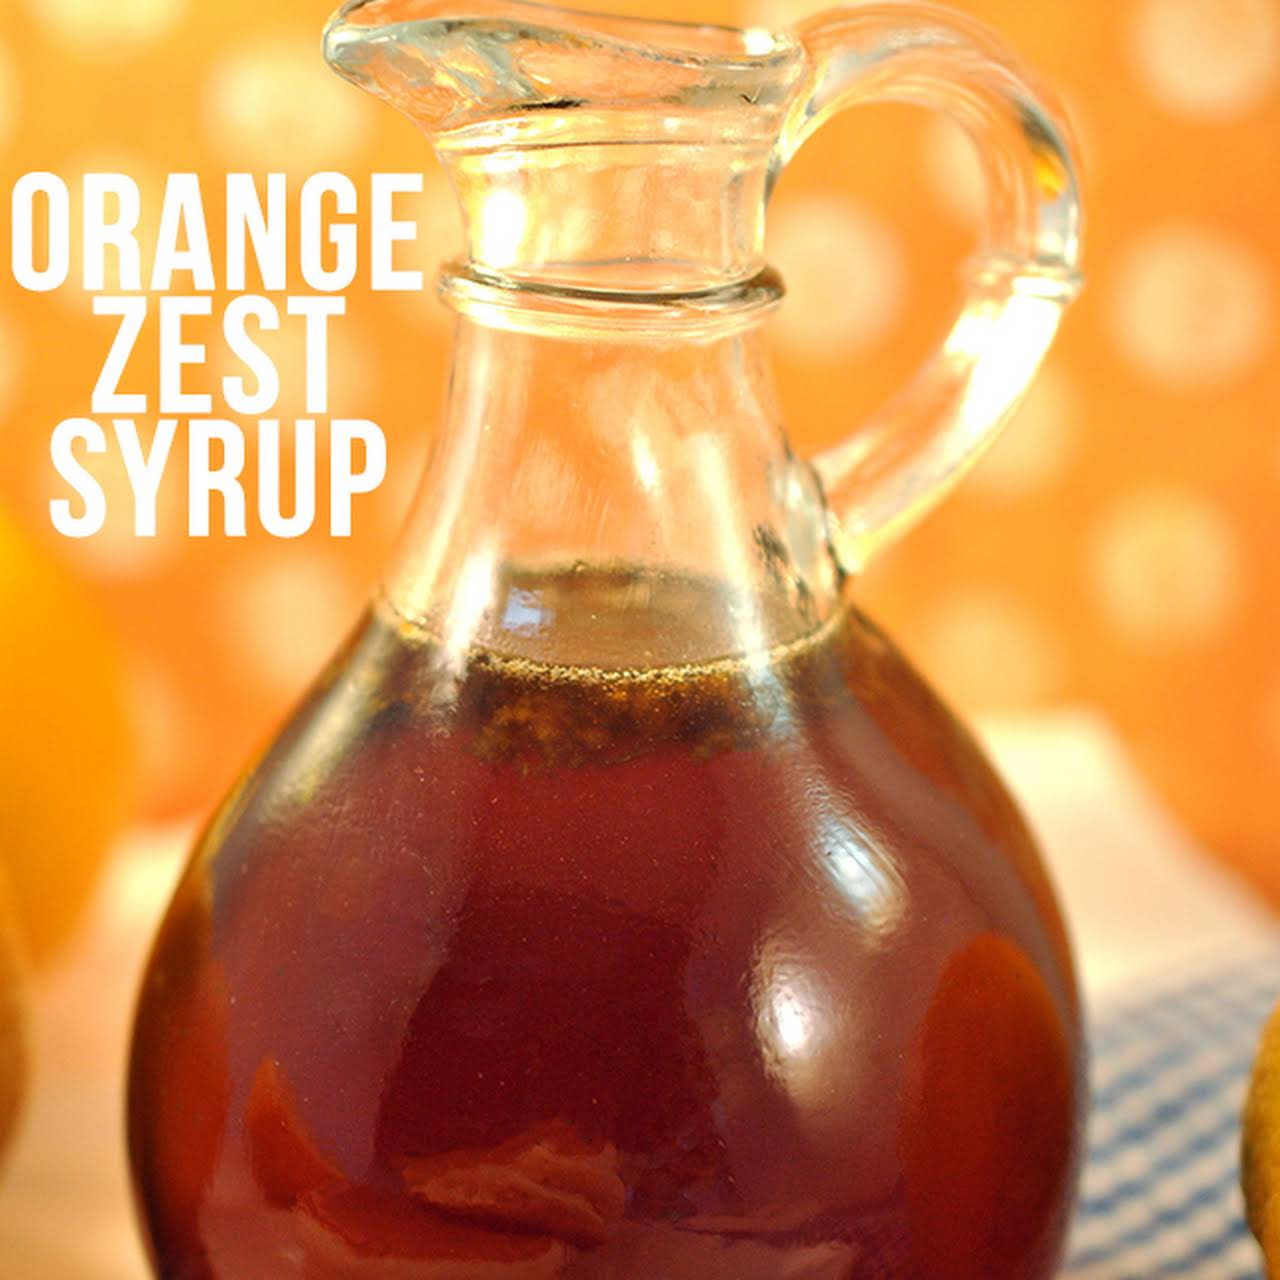 Orange Zest Syrup